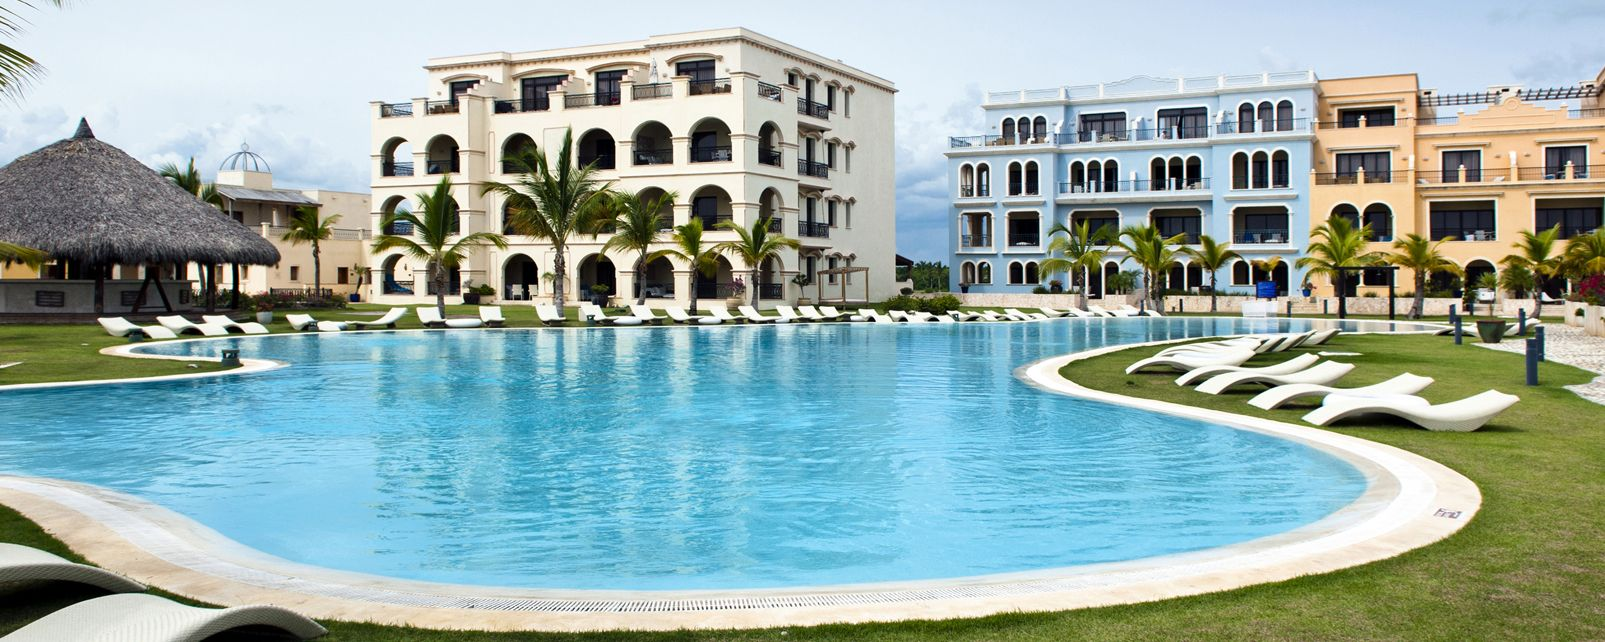 Hotel Ancora Punta Cana